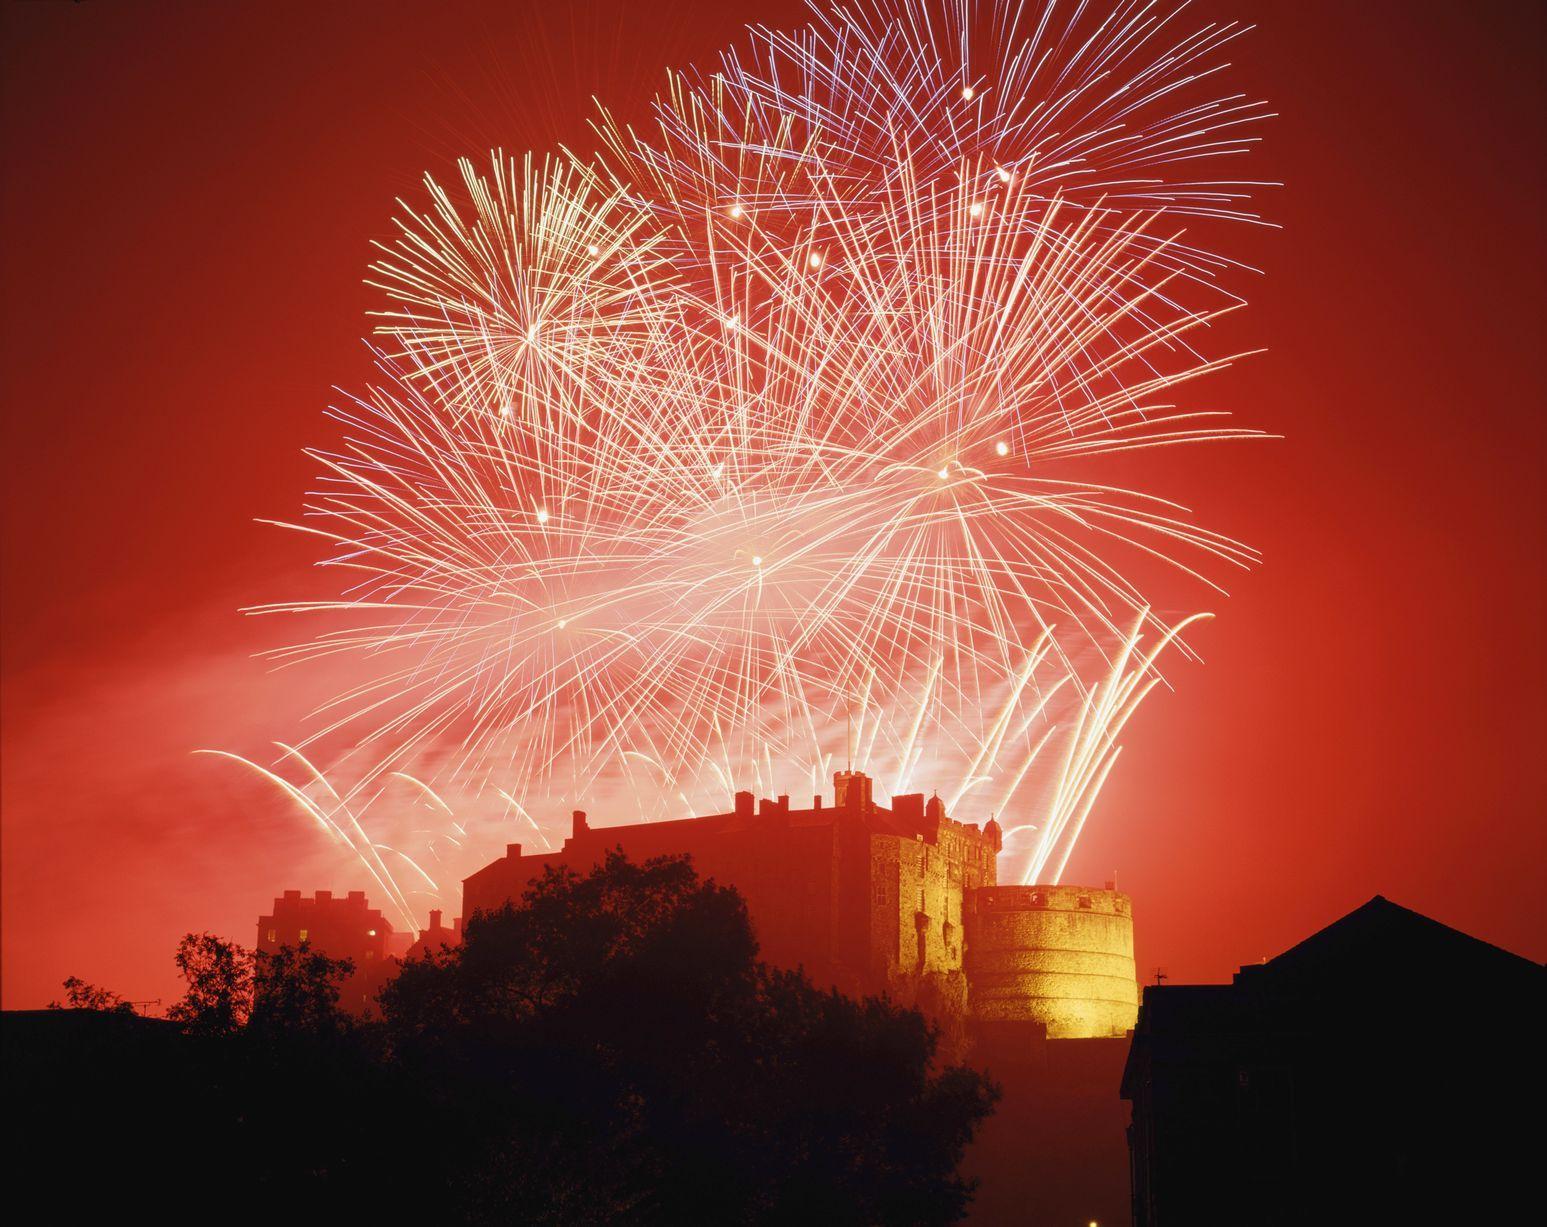 edinburgh castle fireworks new year